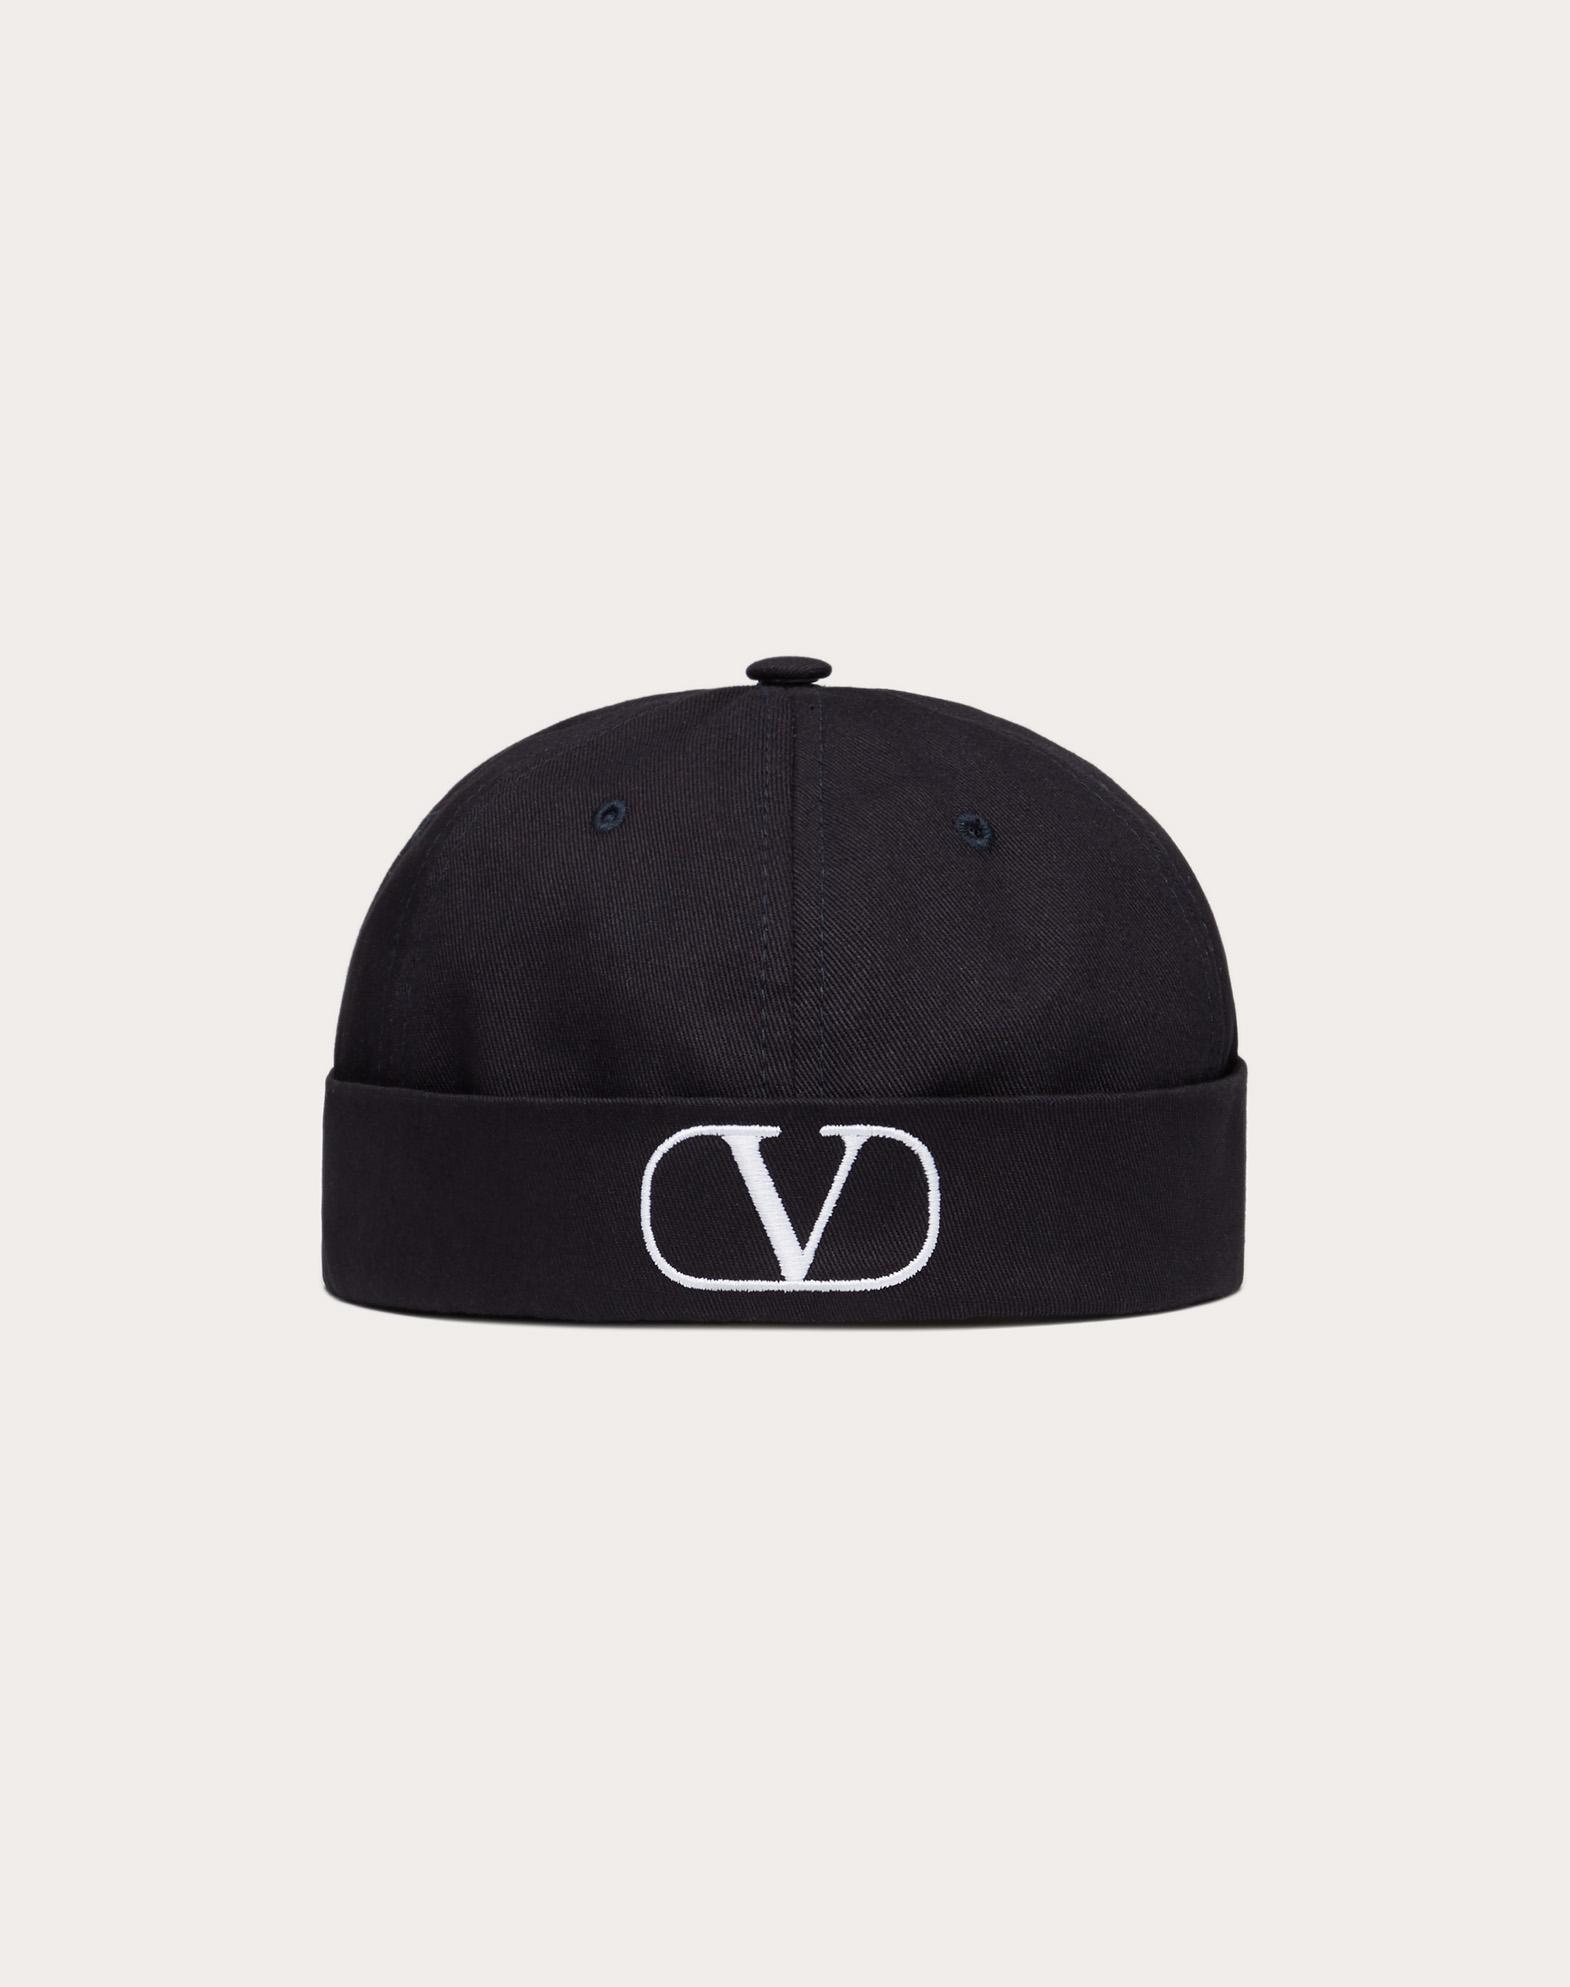 Cappello beanie VLOGO in cotone